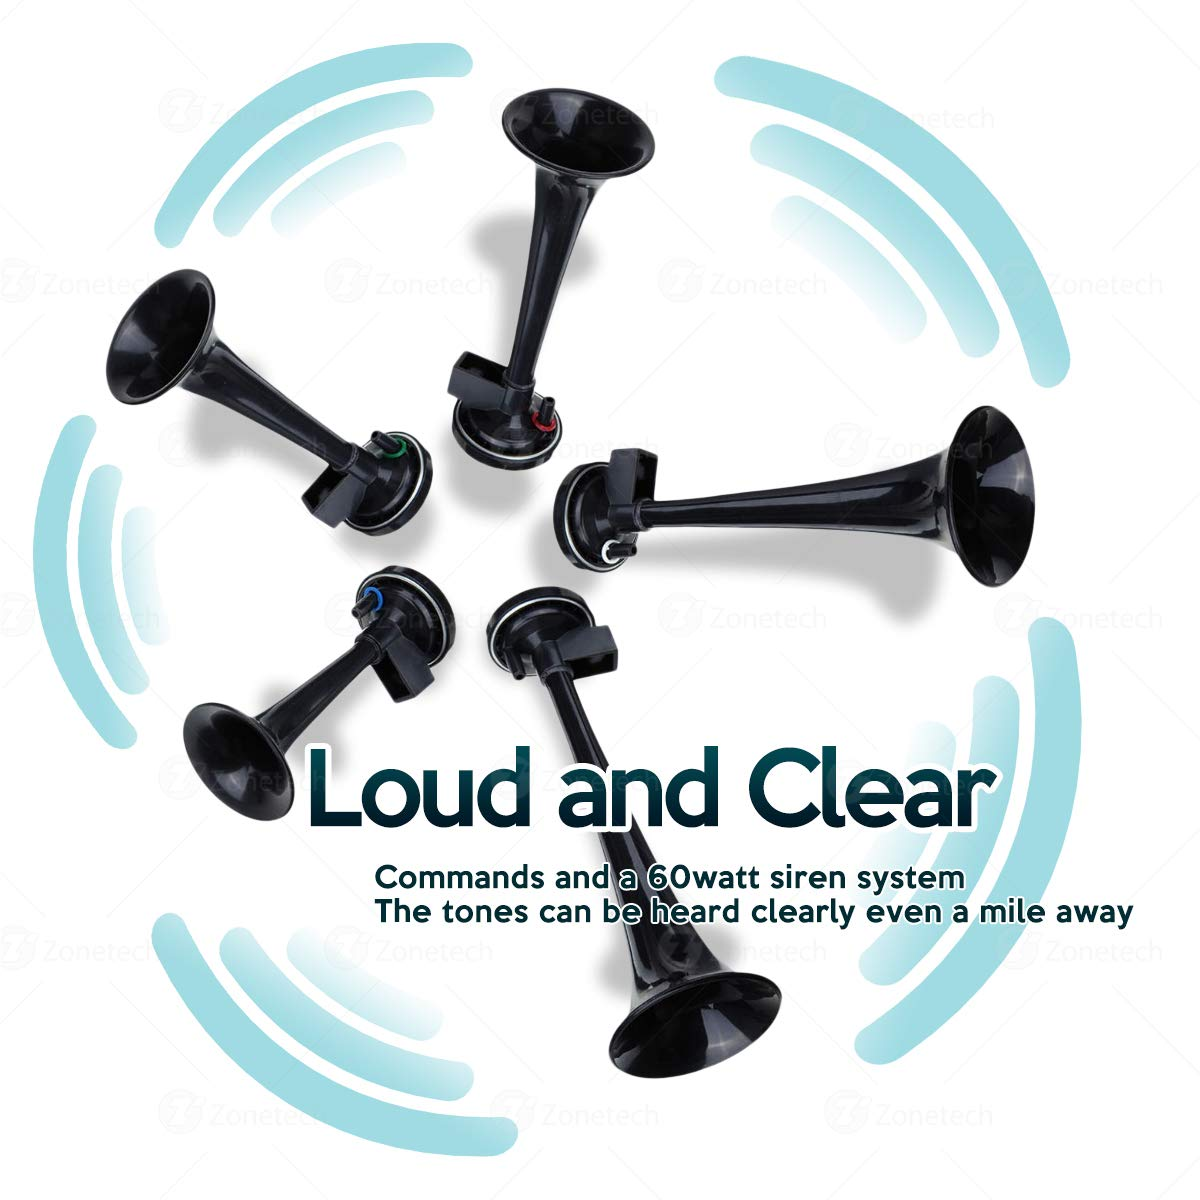 Compressor Super Loud 125db Zone Tech 12V 5 Trumpet Dixie Air Horn Premium Quality 5 Black Trumpet Air Horn